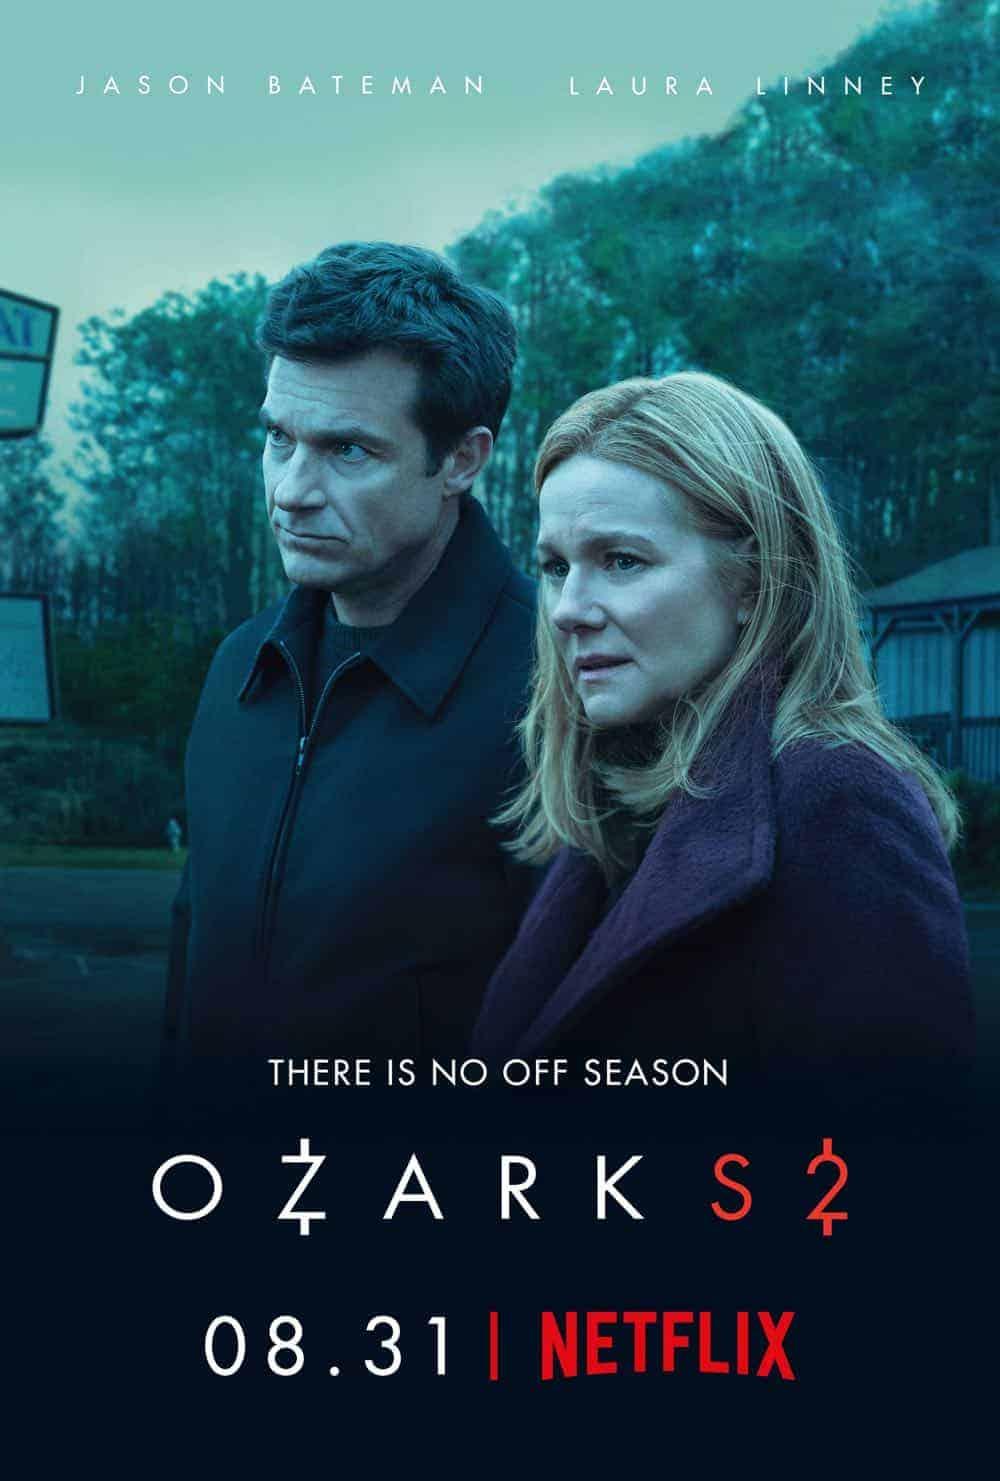 OZARK Season 2 Trailer And Poster Key Art